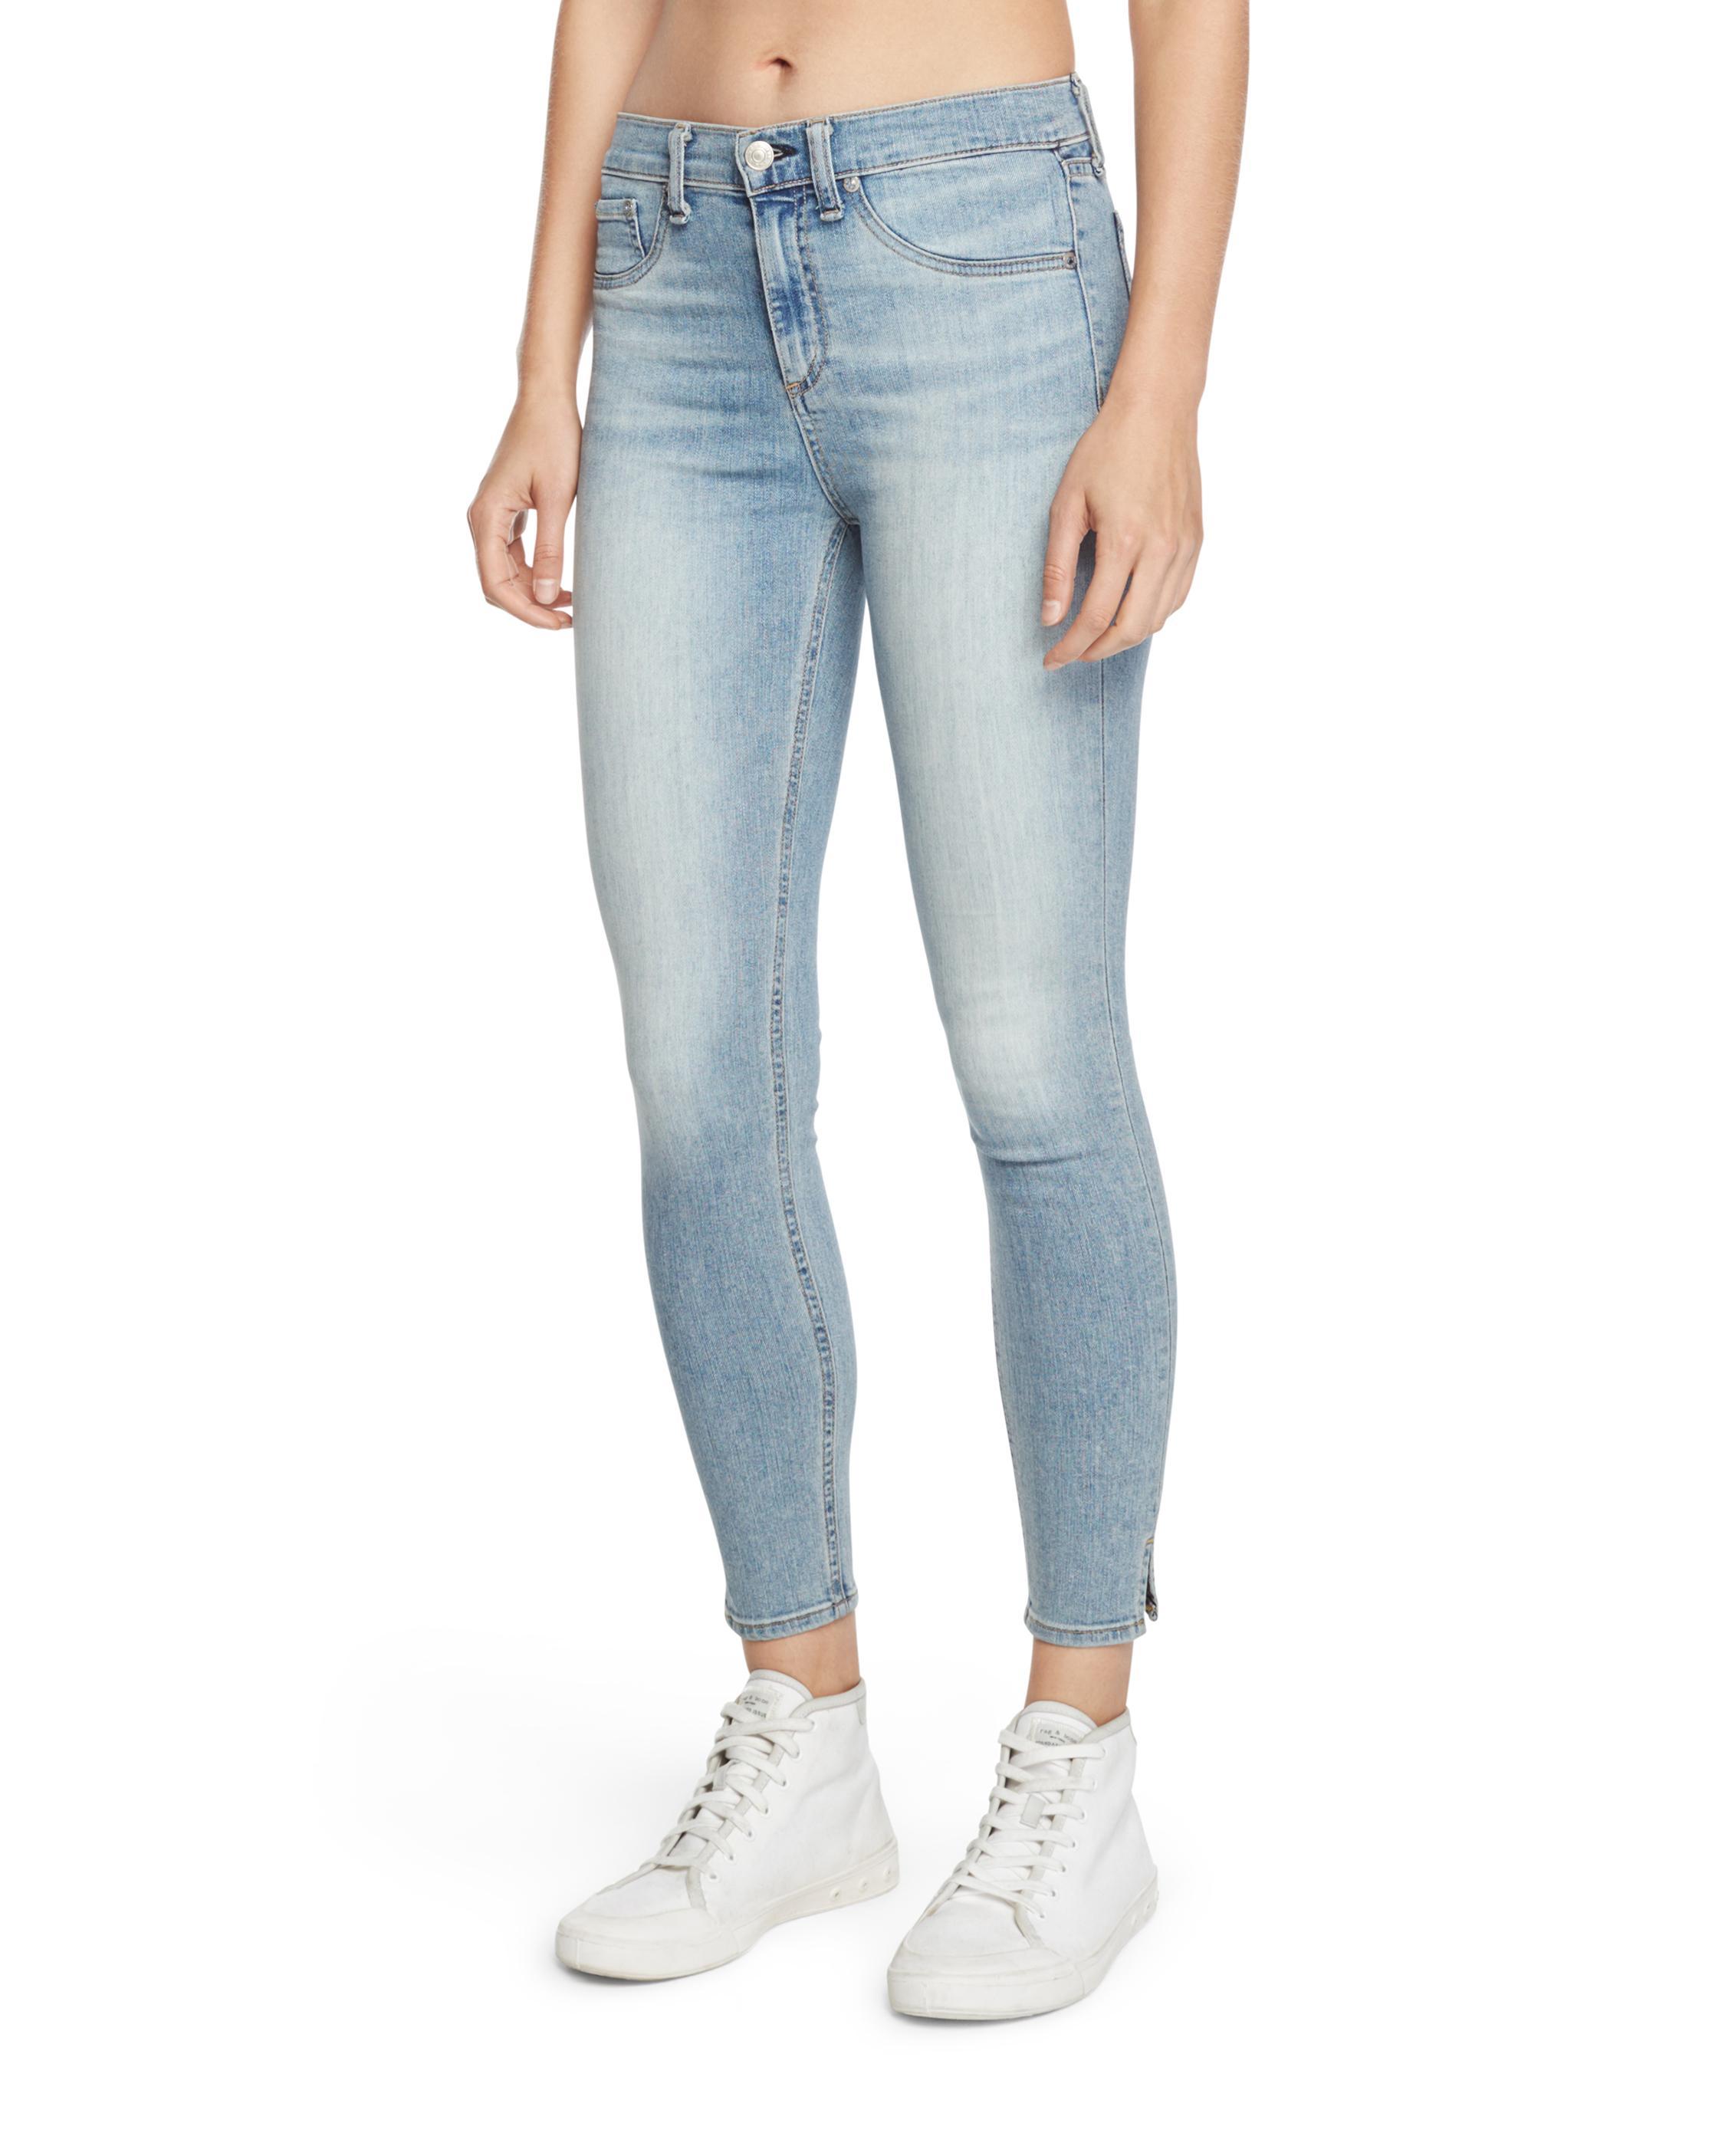 6bfc3dee46b 10 Inch Capri With Slit   Women Jeans   rag & bone